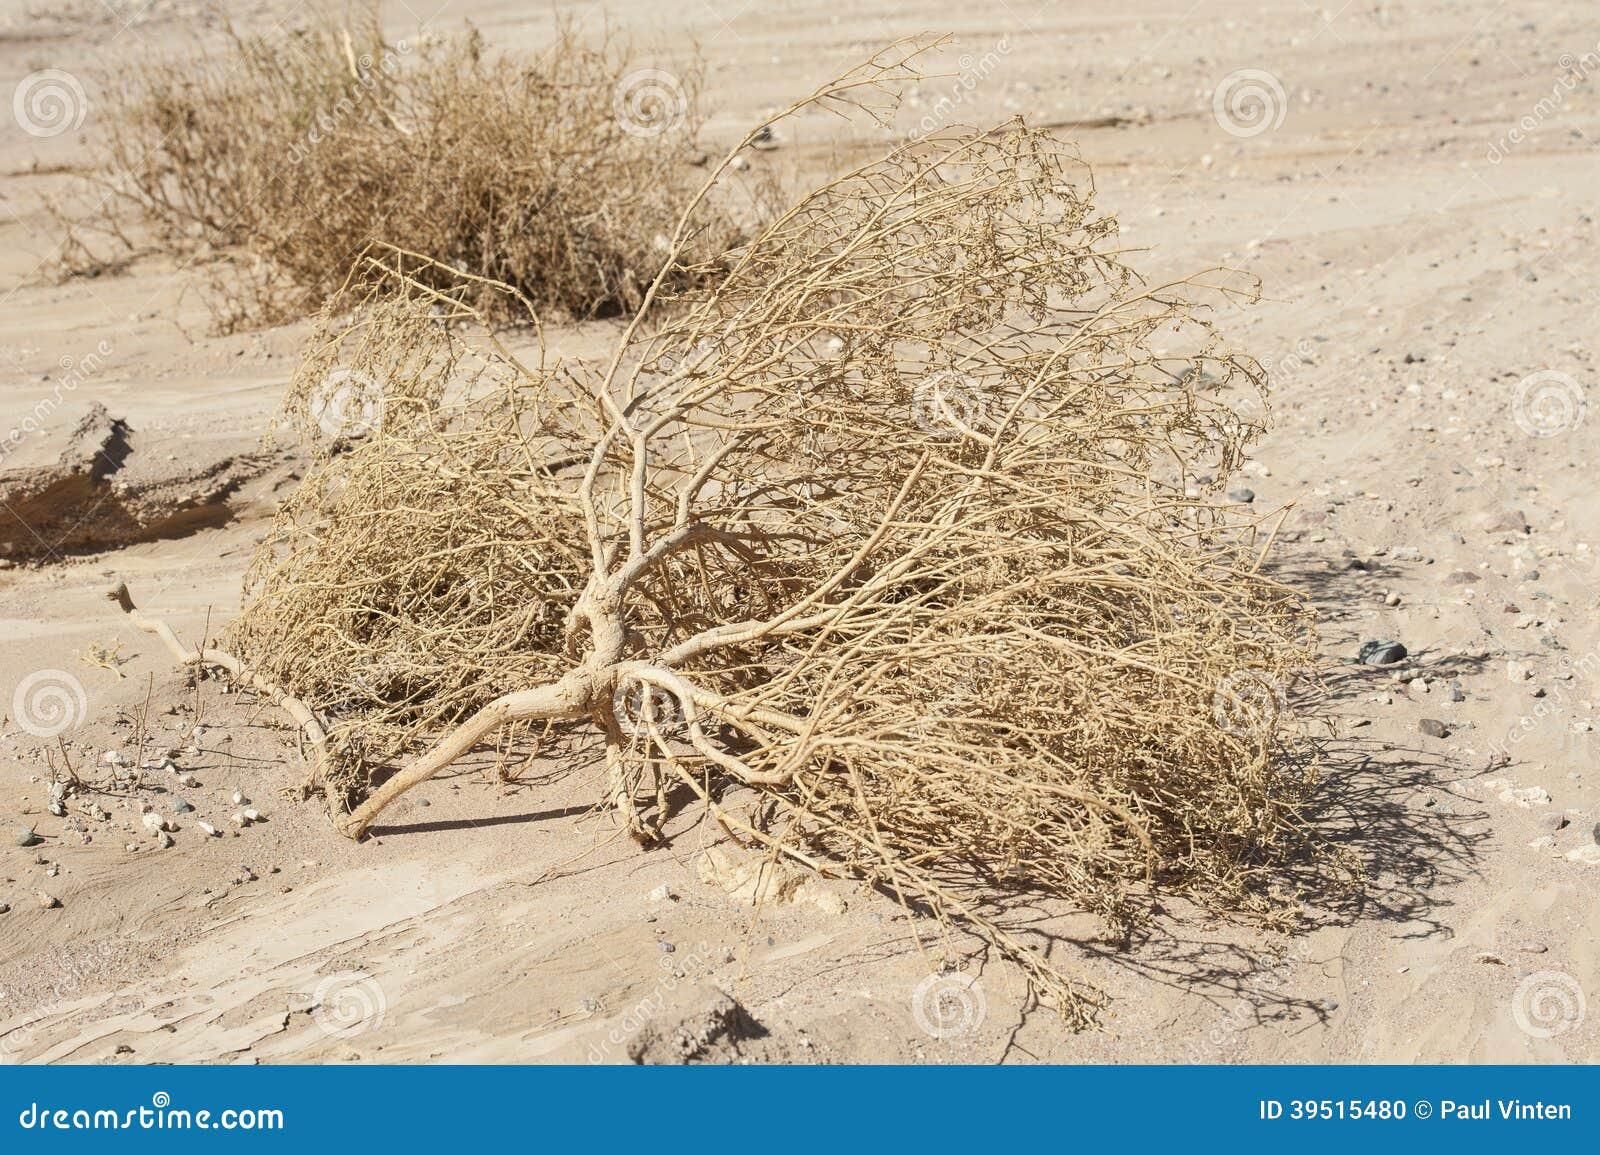 Dried dead plants in an arid desert